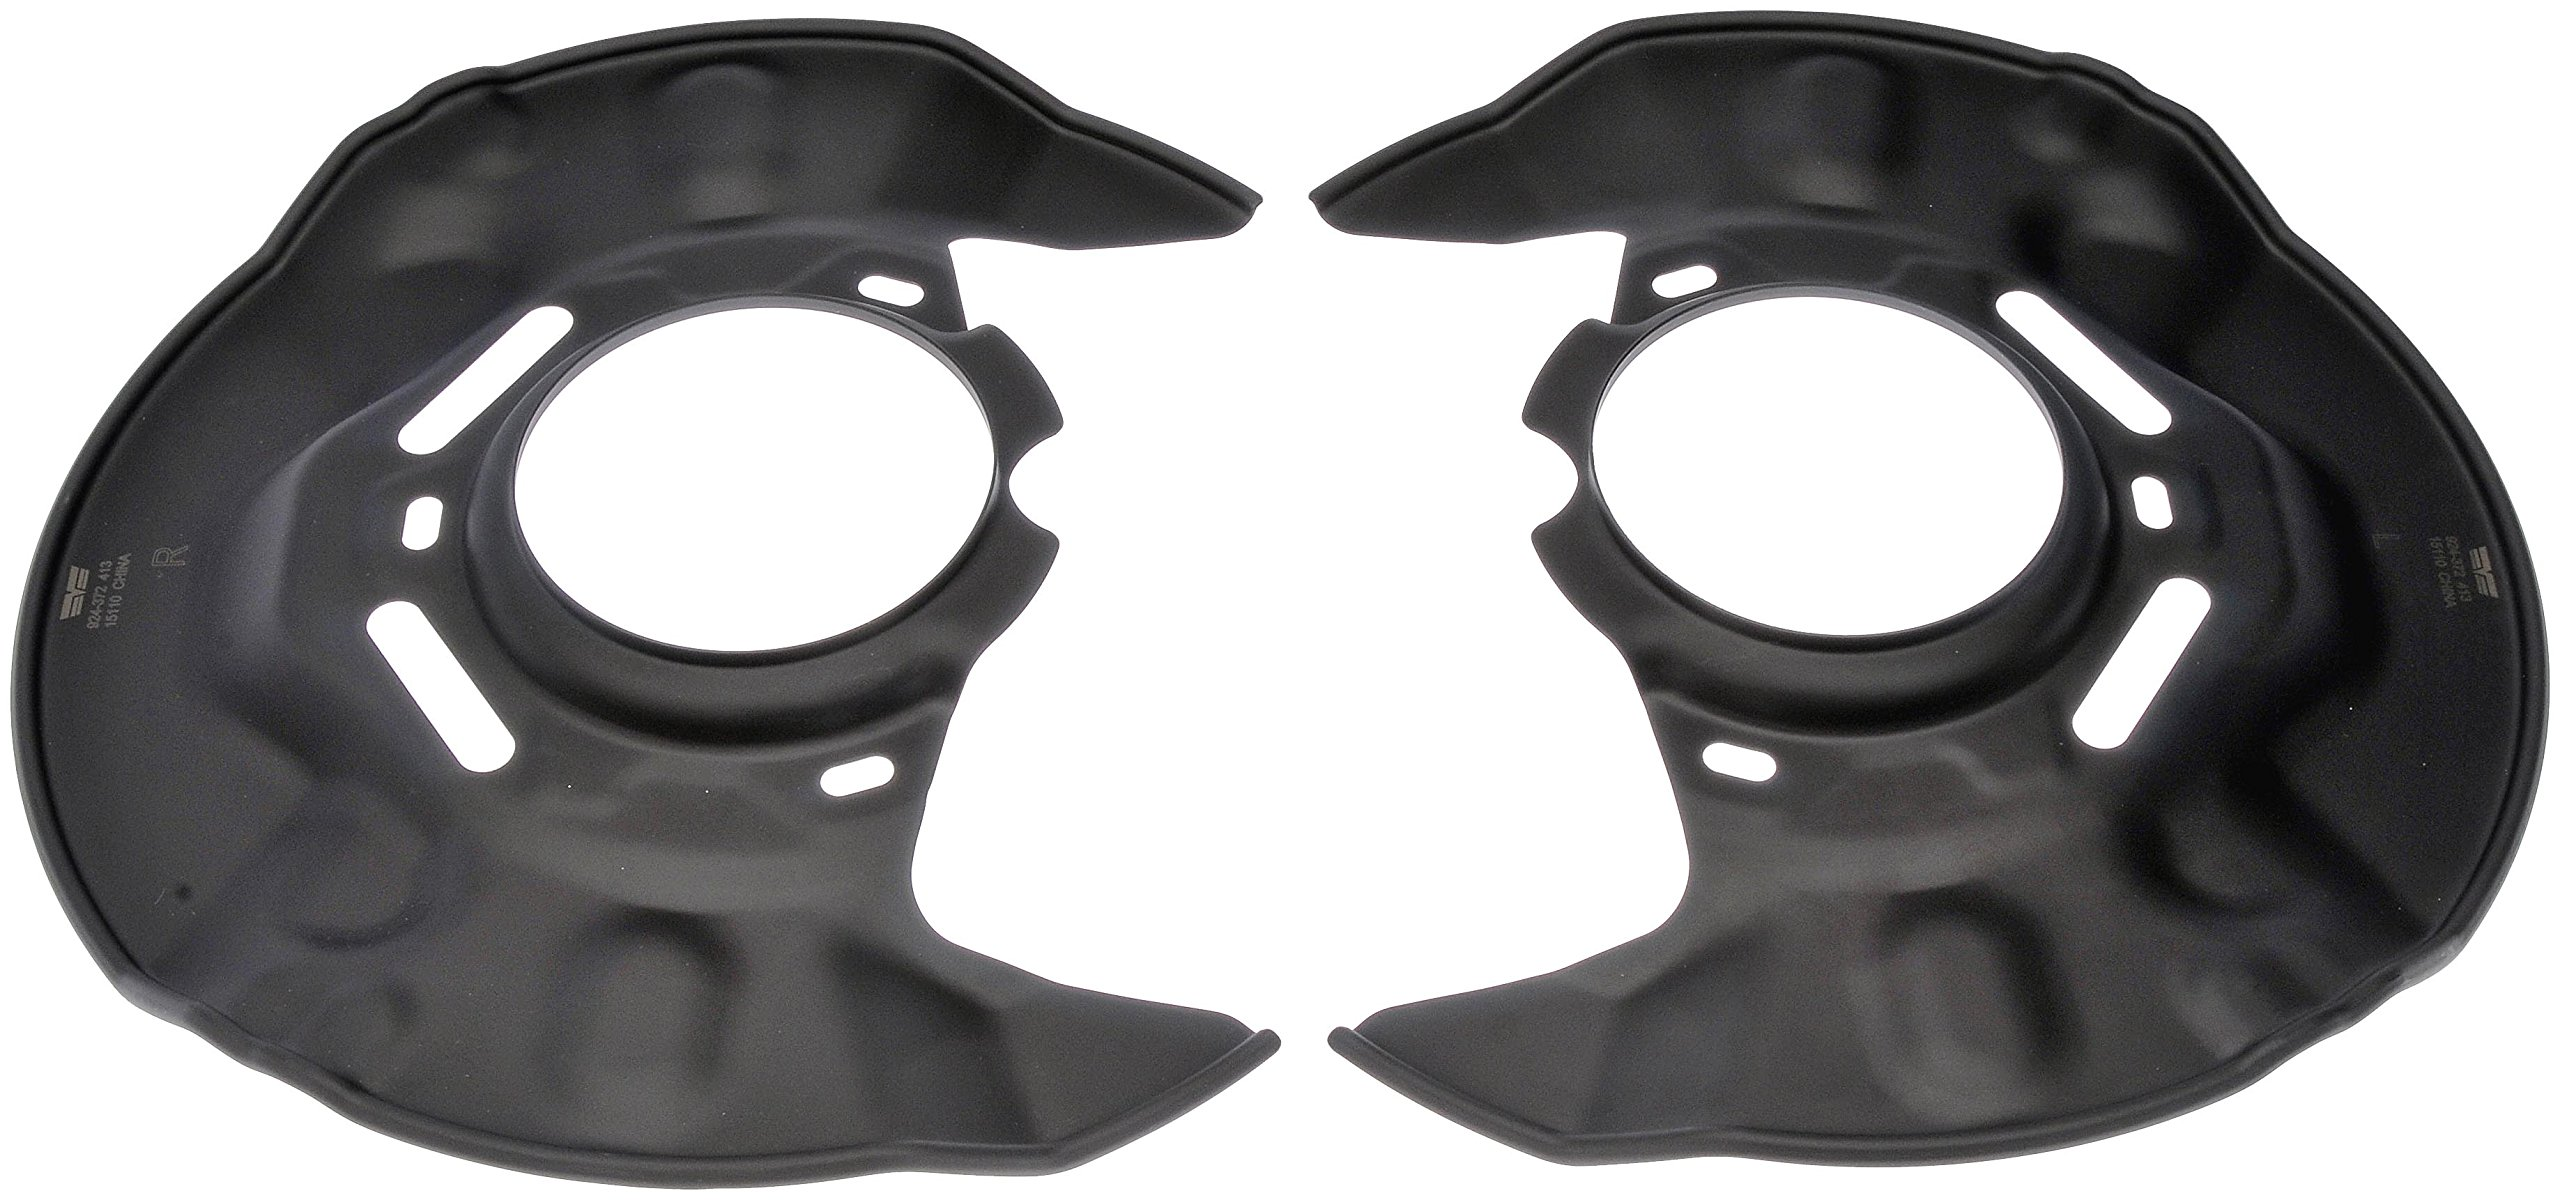 Dorman 924-372 Brake Dust Shield, Pair